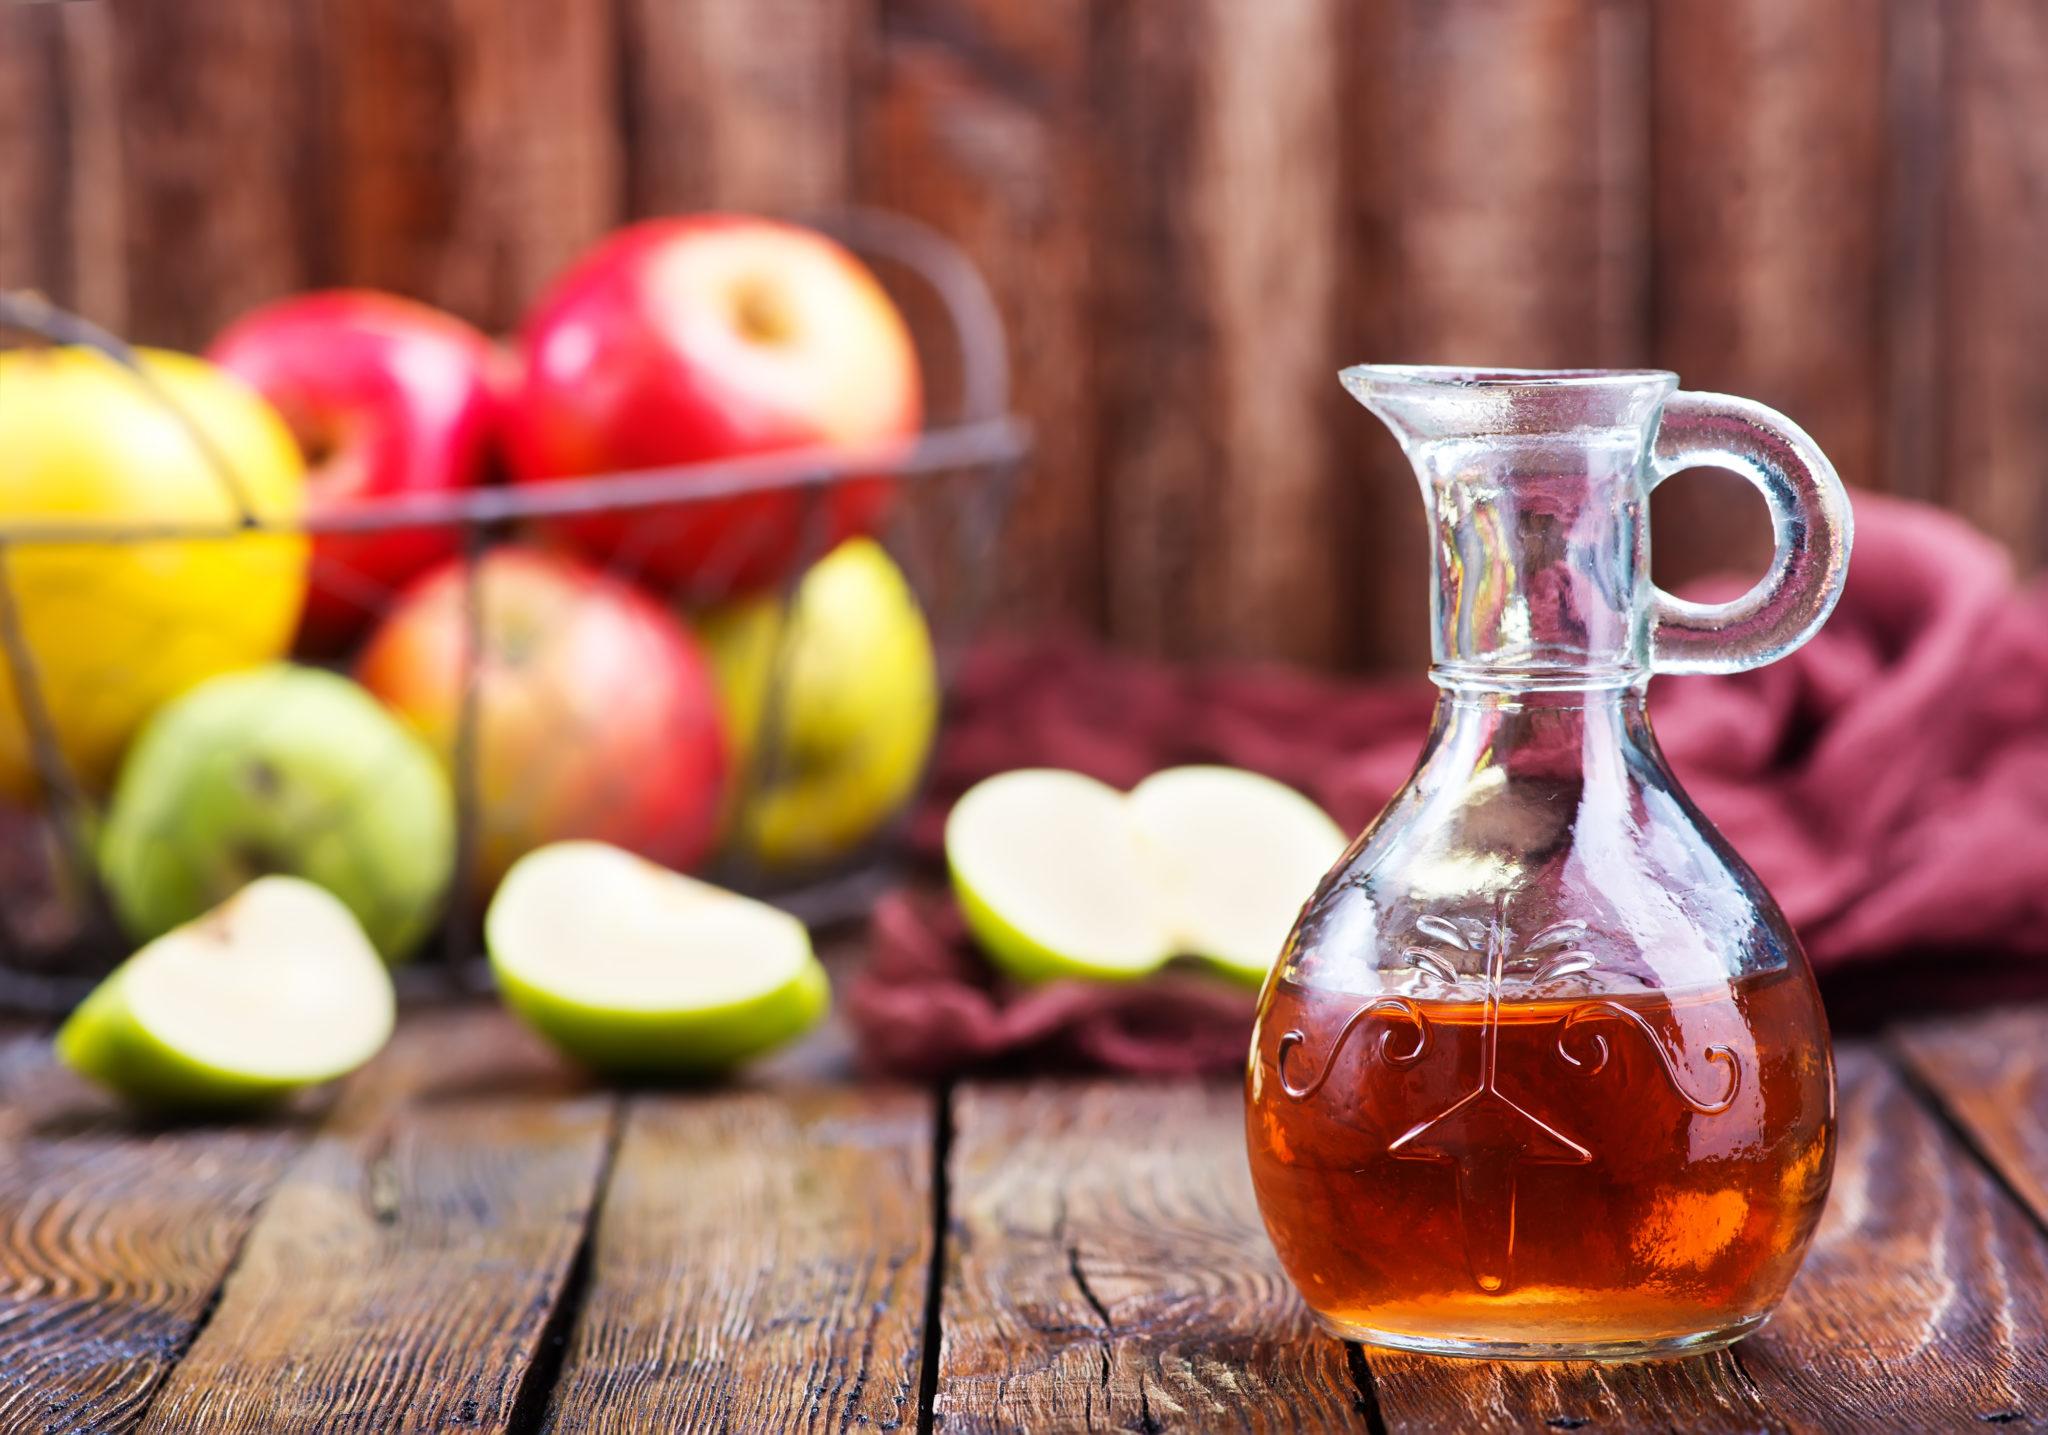 Apple Cider Vinegar for Back Pain, The Natural Healing Powers Of Apple Cider Vinegar For Back Pain